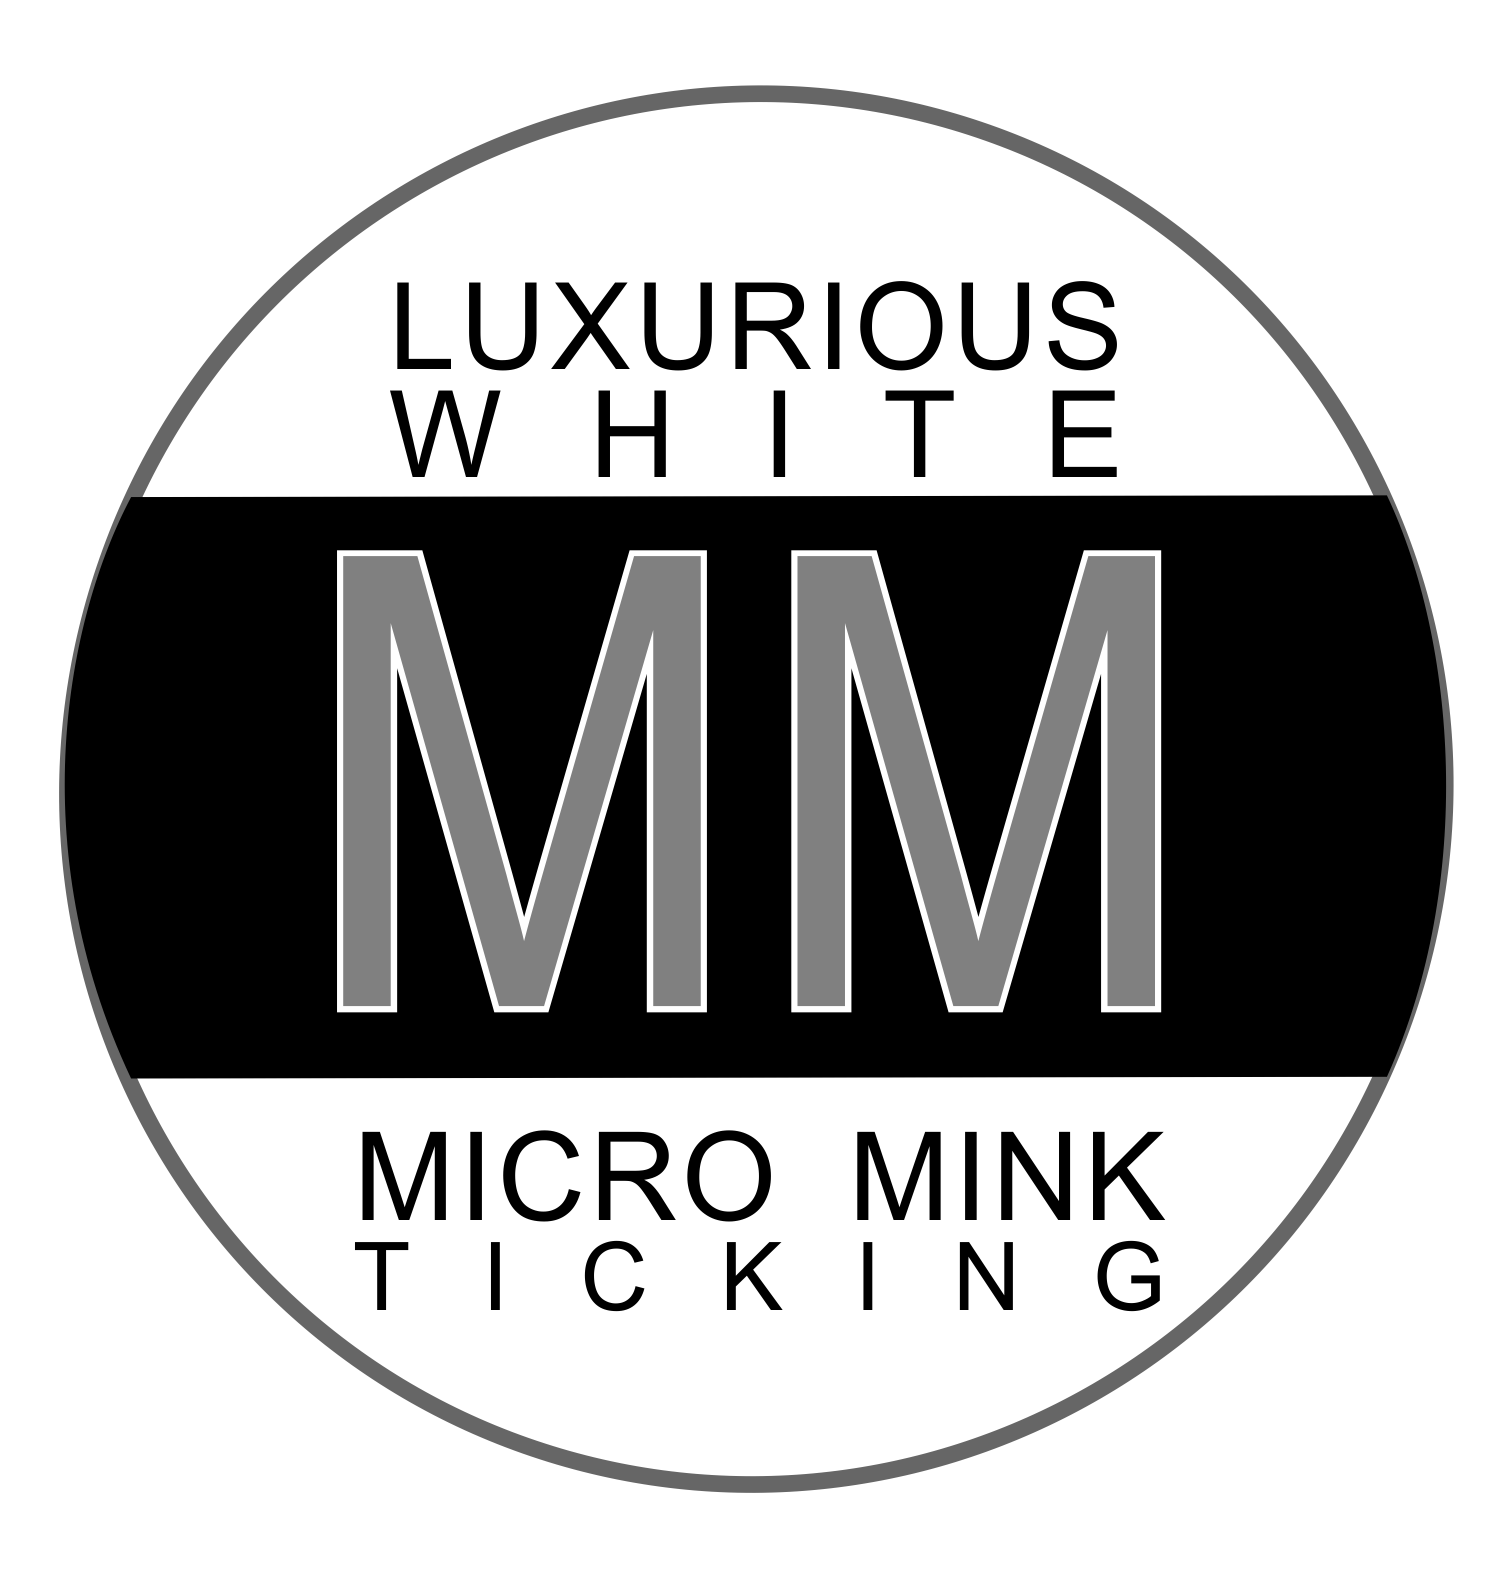 Micro Mink